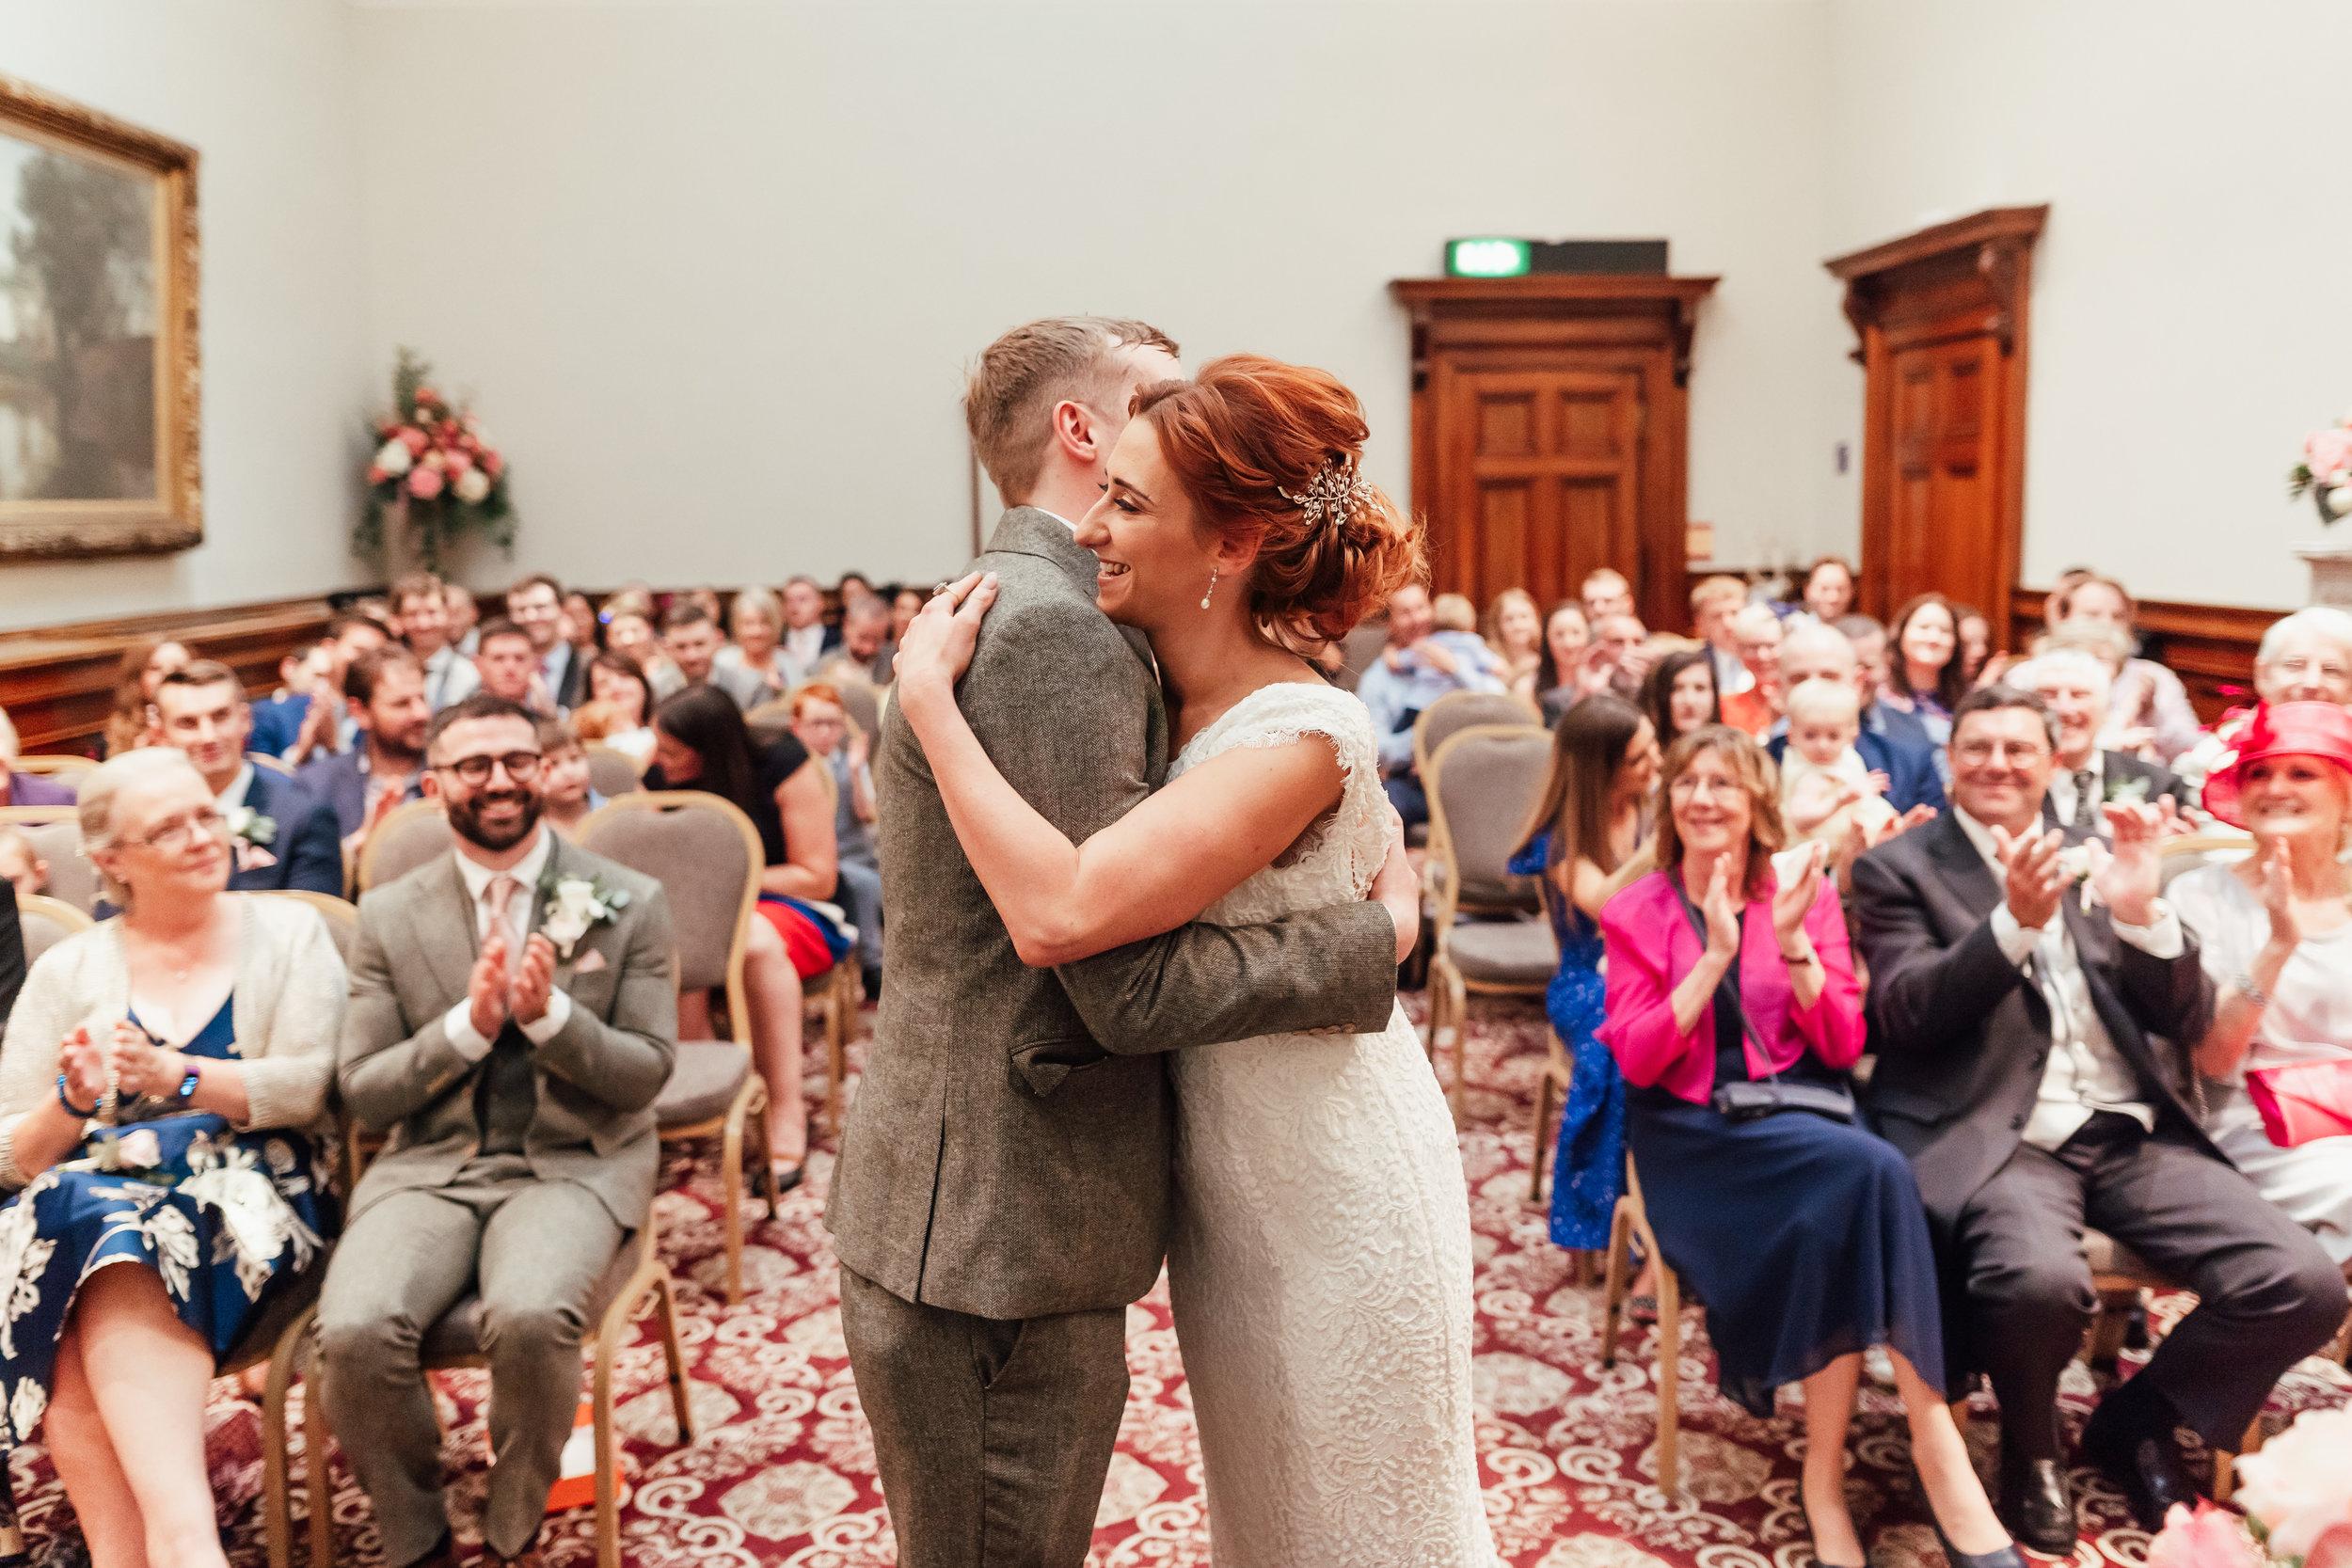 st-georges-hall-liverpool-wedding-105.jpg